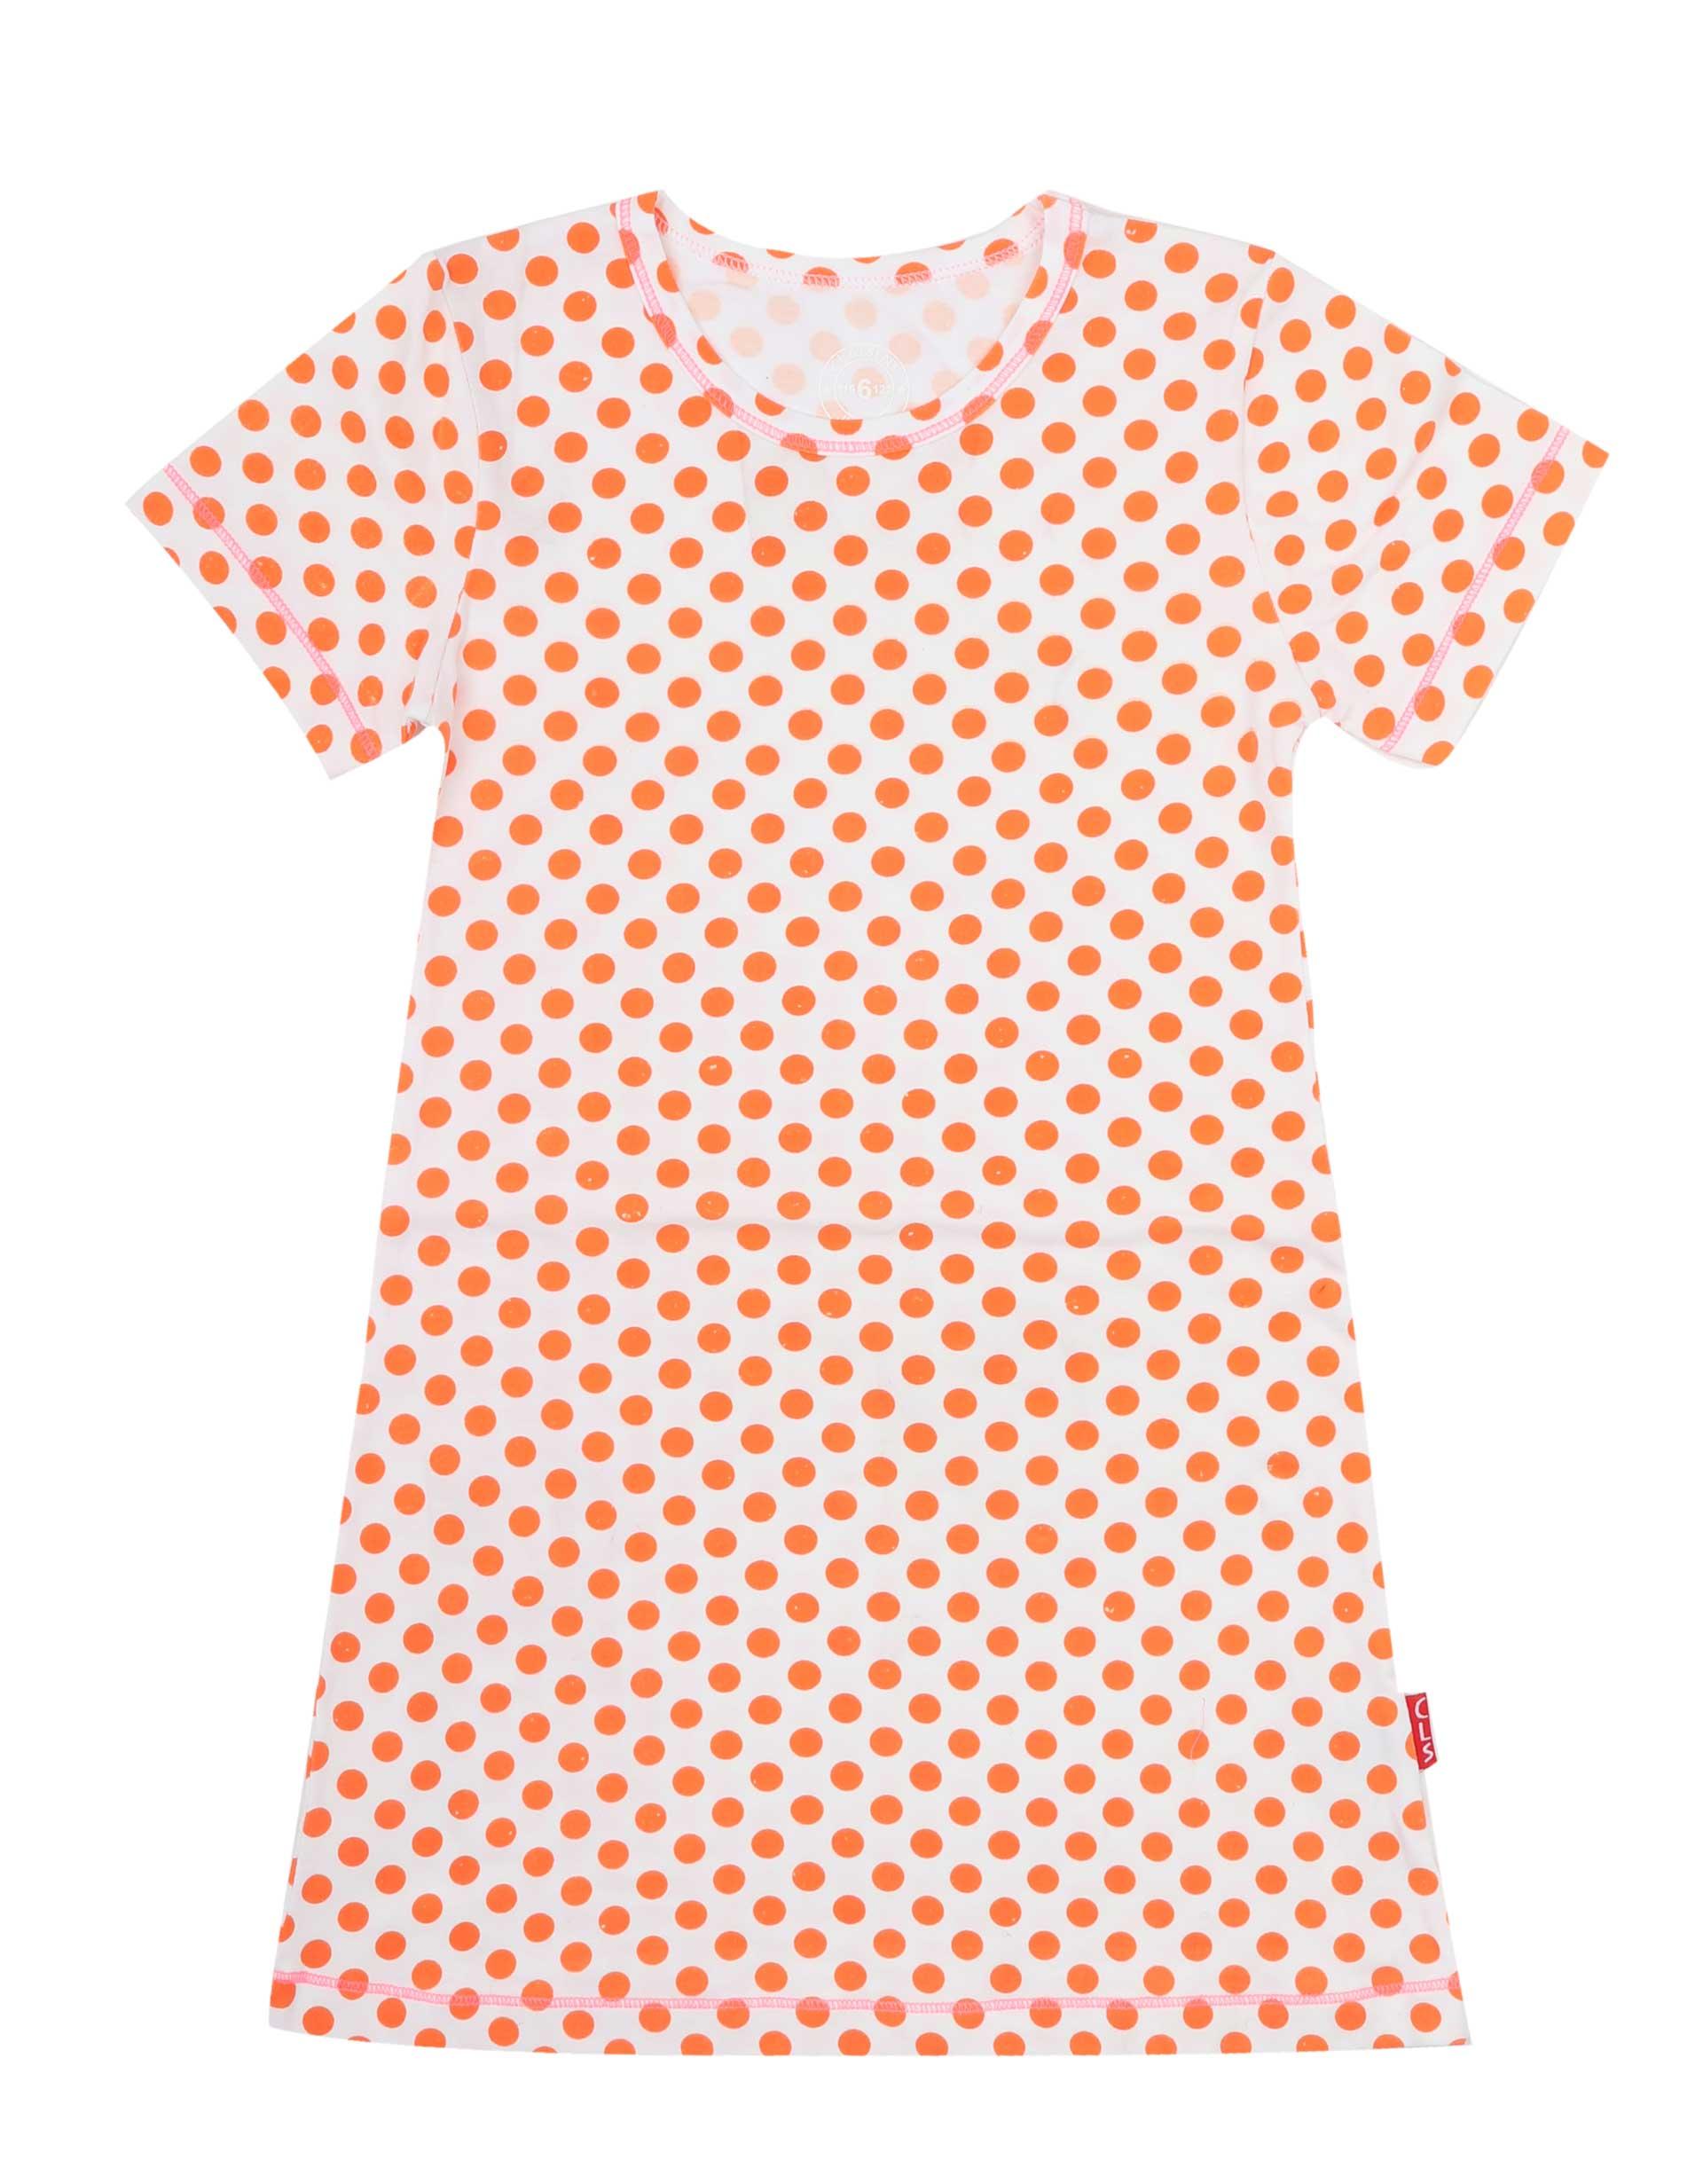 Jurk Orange Dots